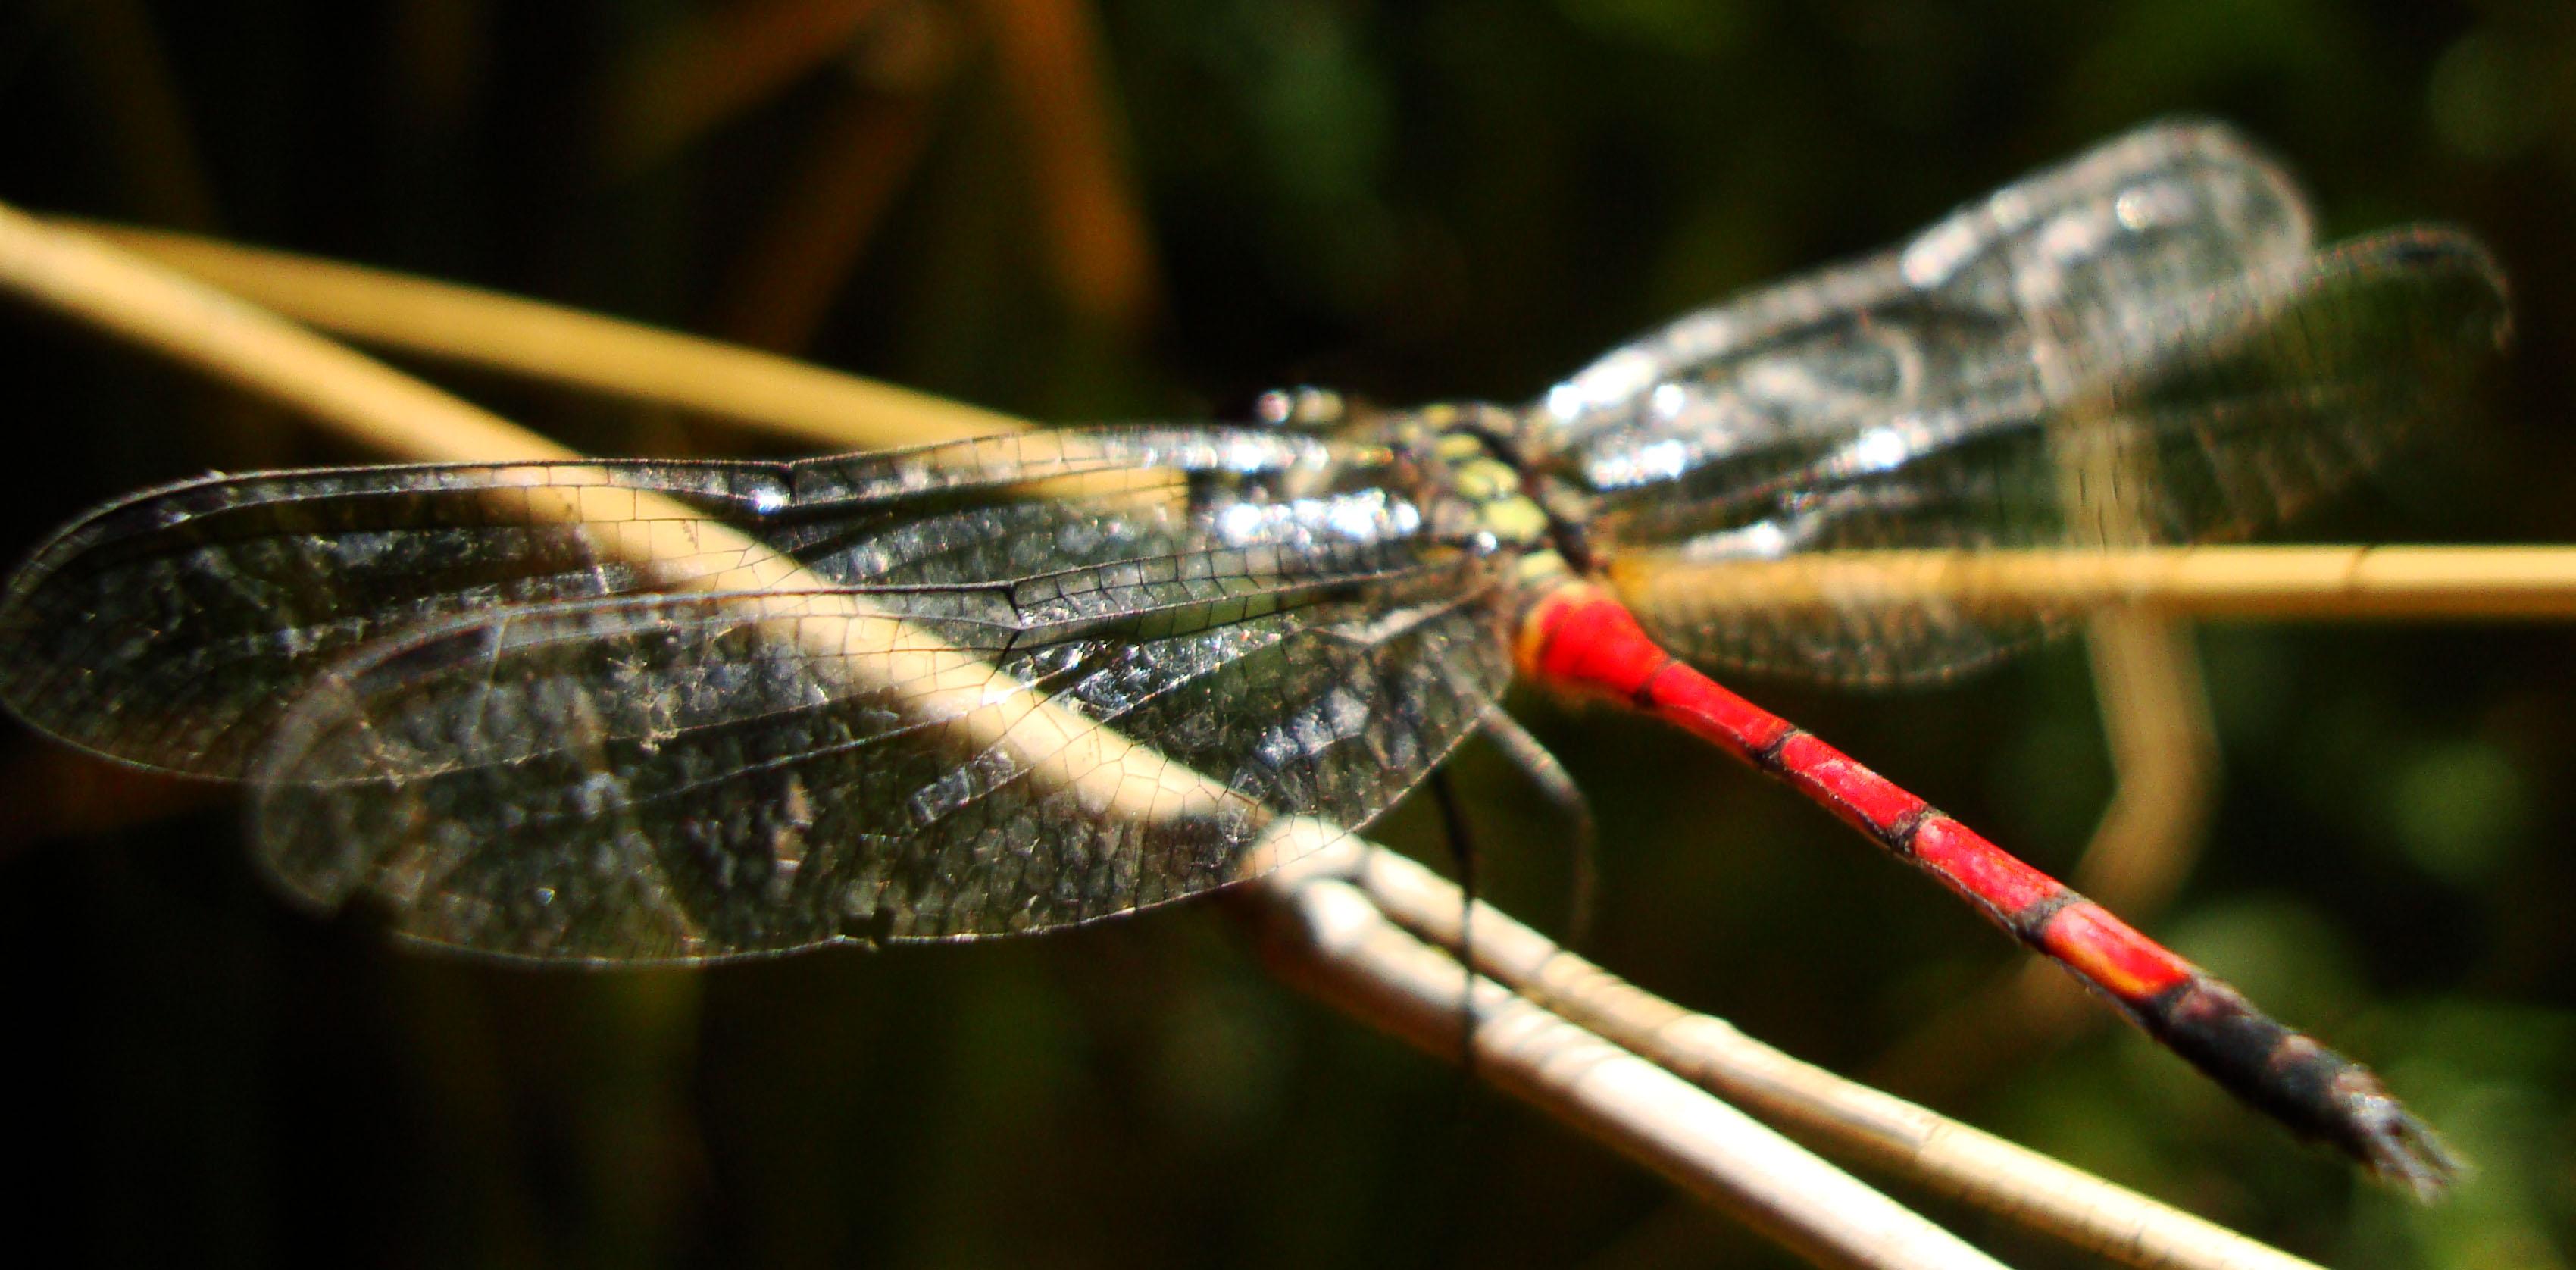 Libellulidae Red Swampdragon Agrionoptera insignis allogenes Sunshine Coast Qld Australia 150